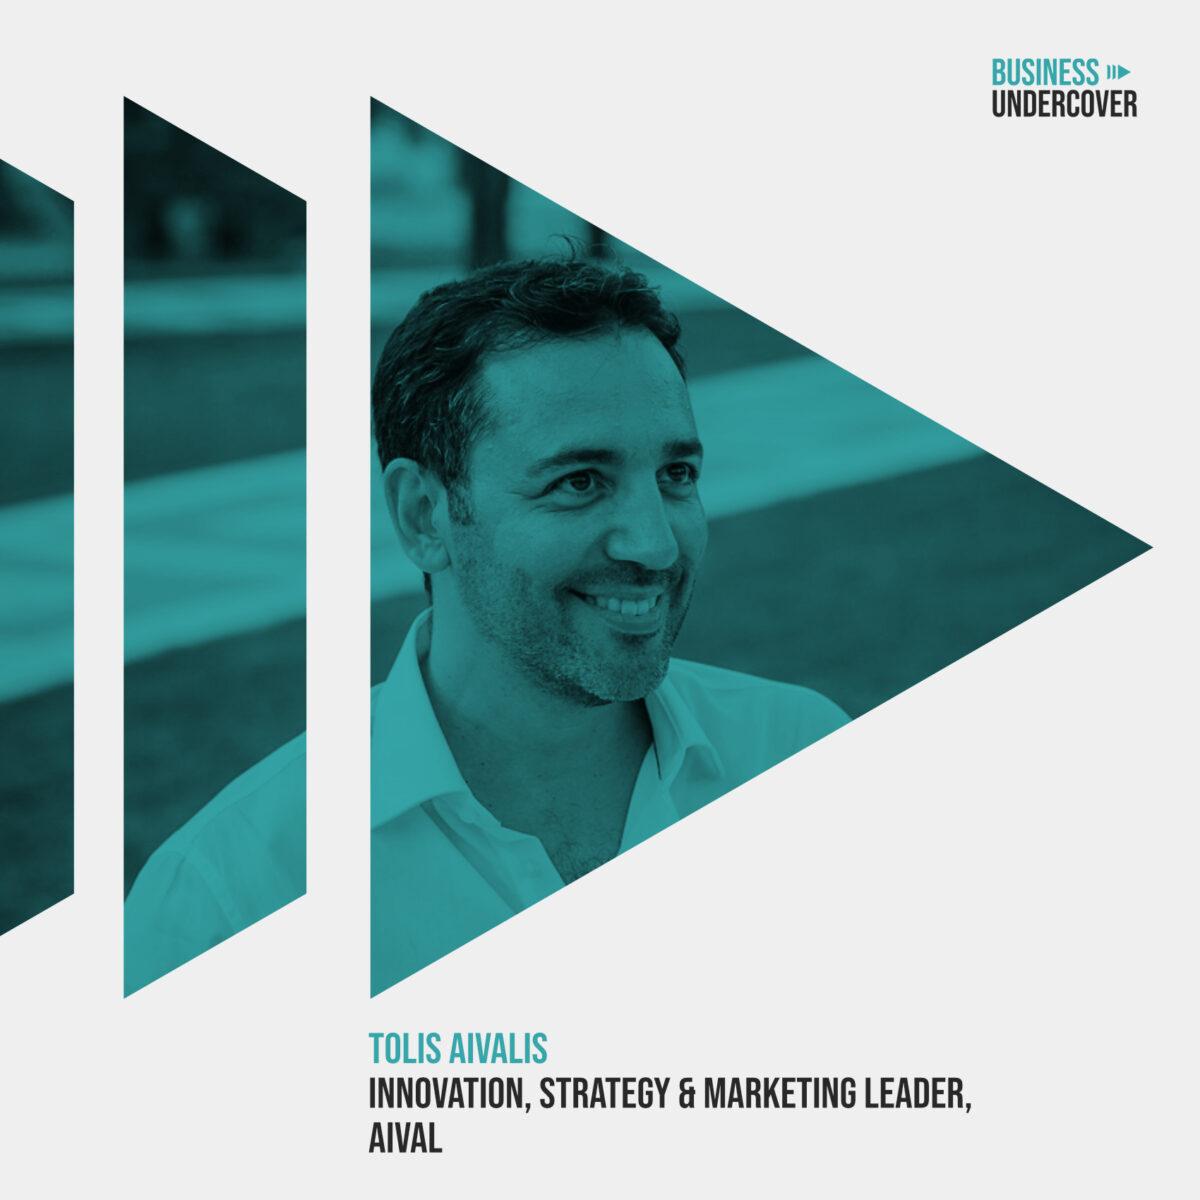 B2B Marketing: Δίνοντας αξία στους πελάτες μας — Τόλης Αιβαλής